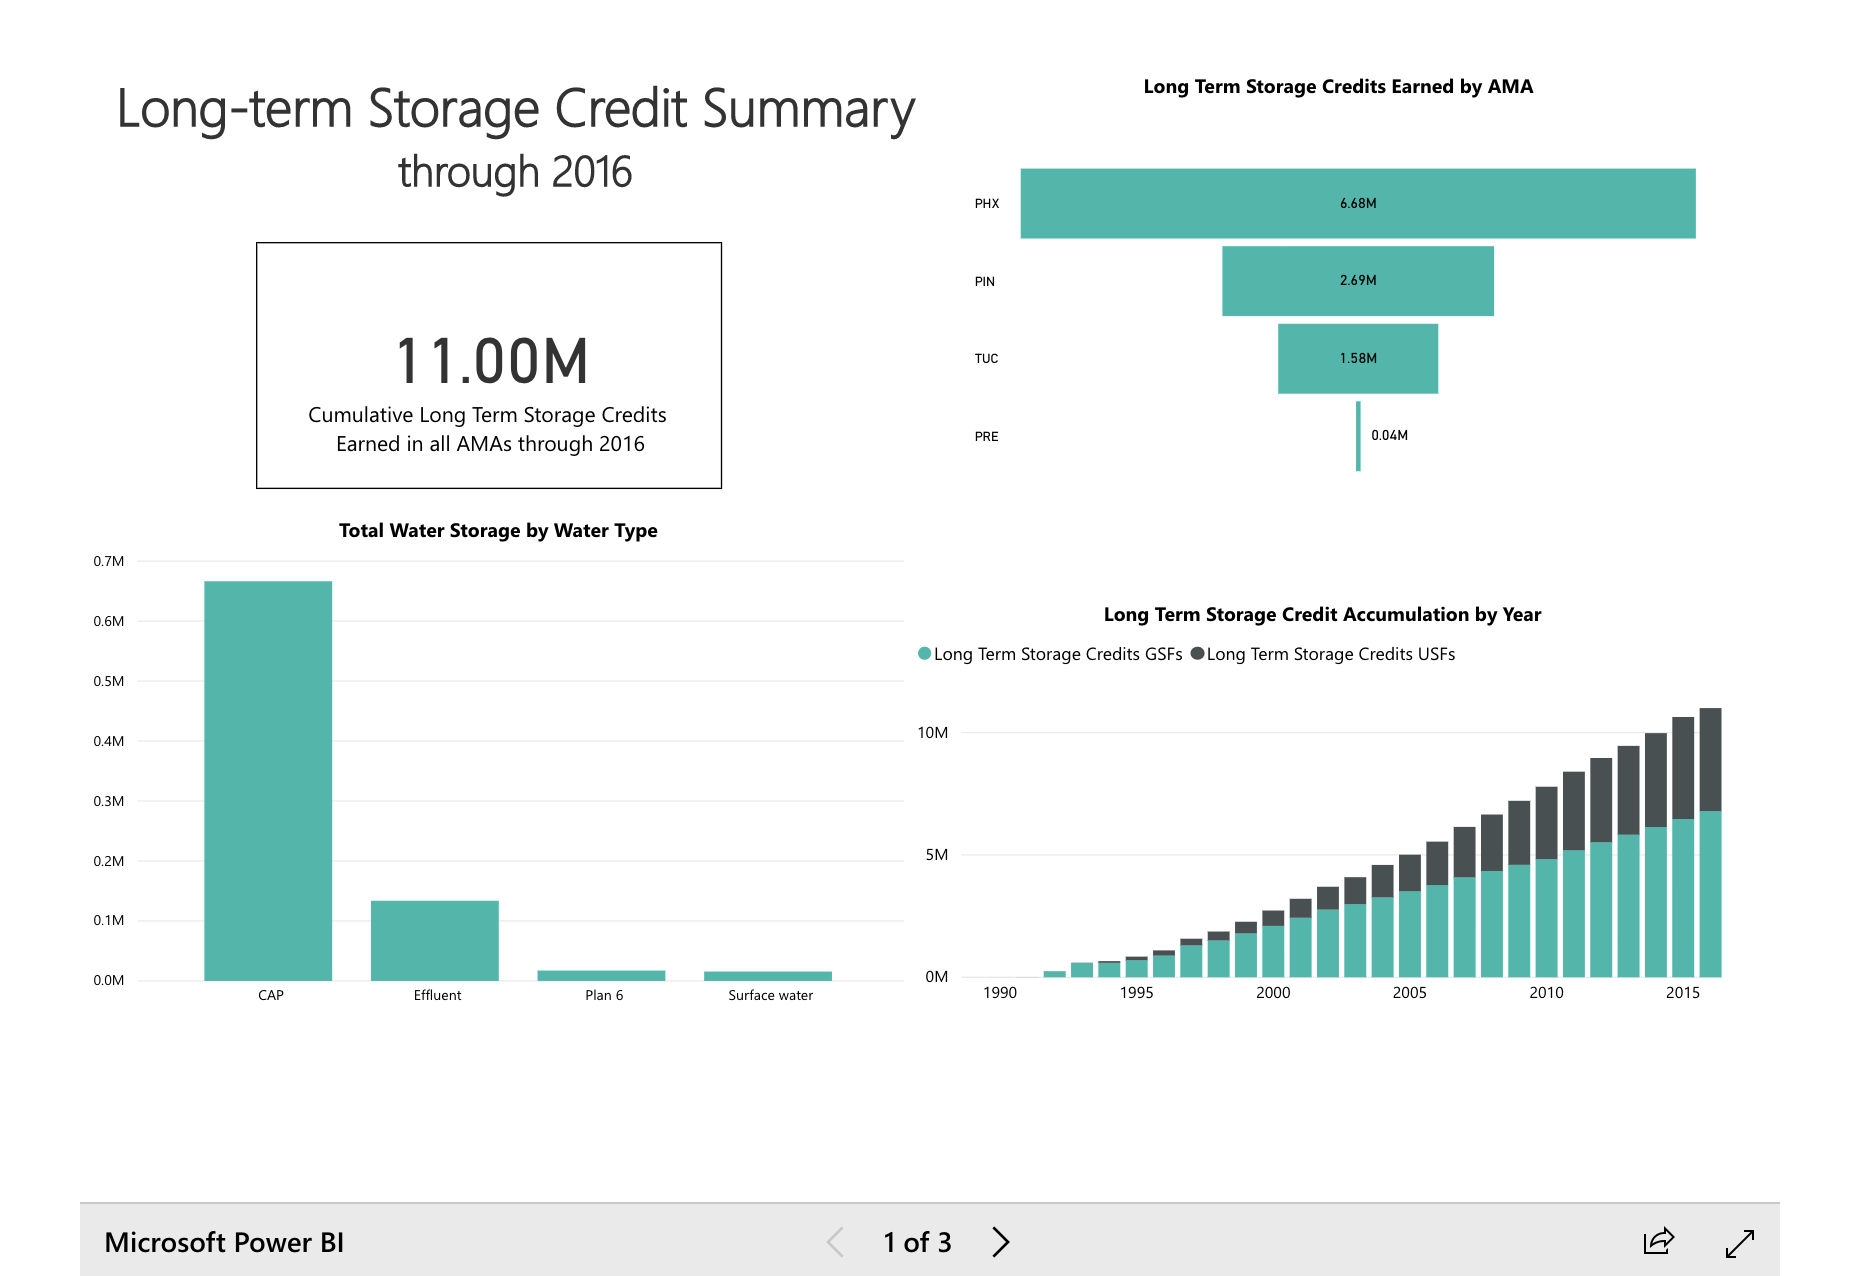 Long-term Storage Credit Summary through 2016